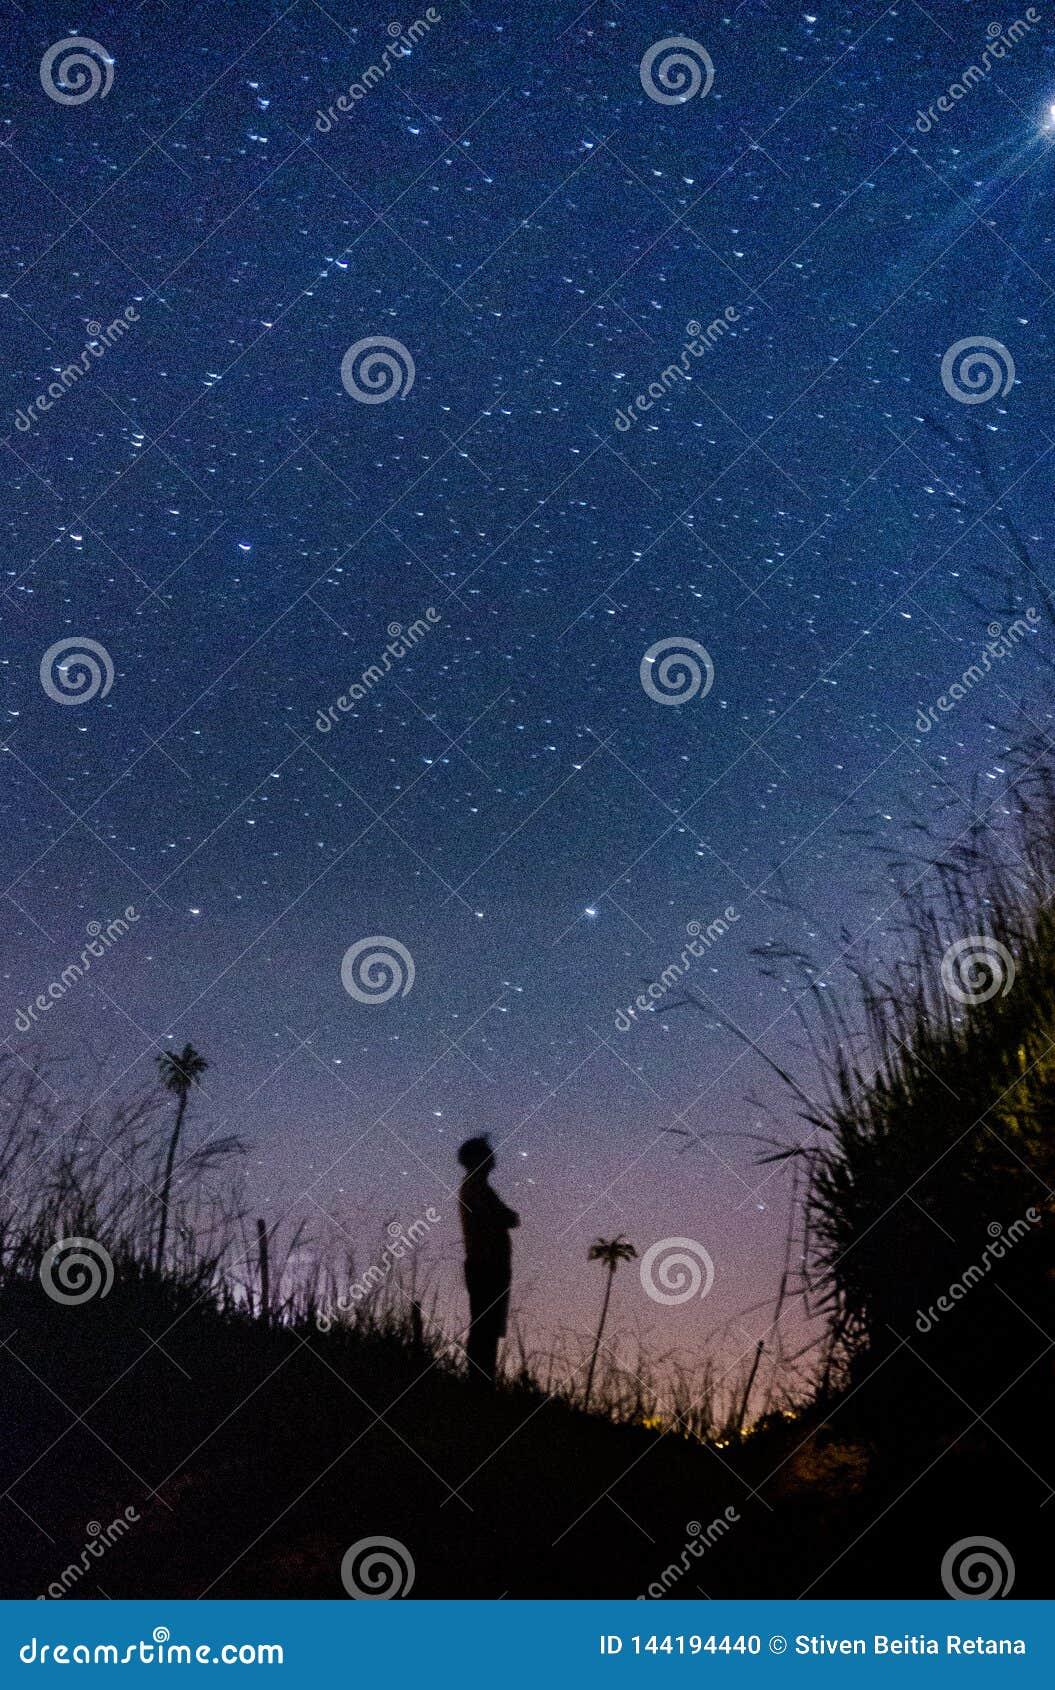 Silueta del hombre que mira el infinito de estrellas